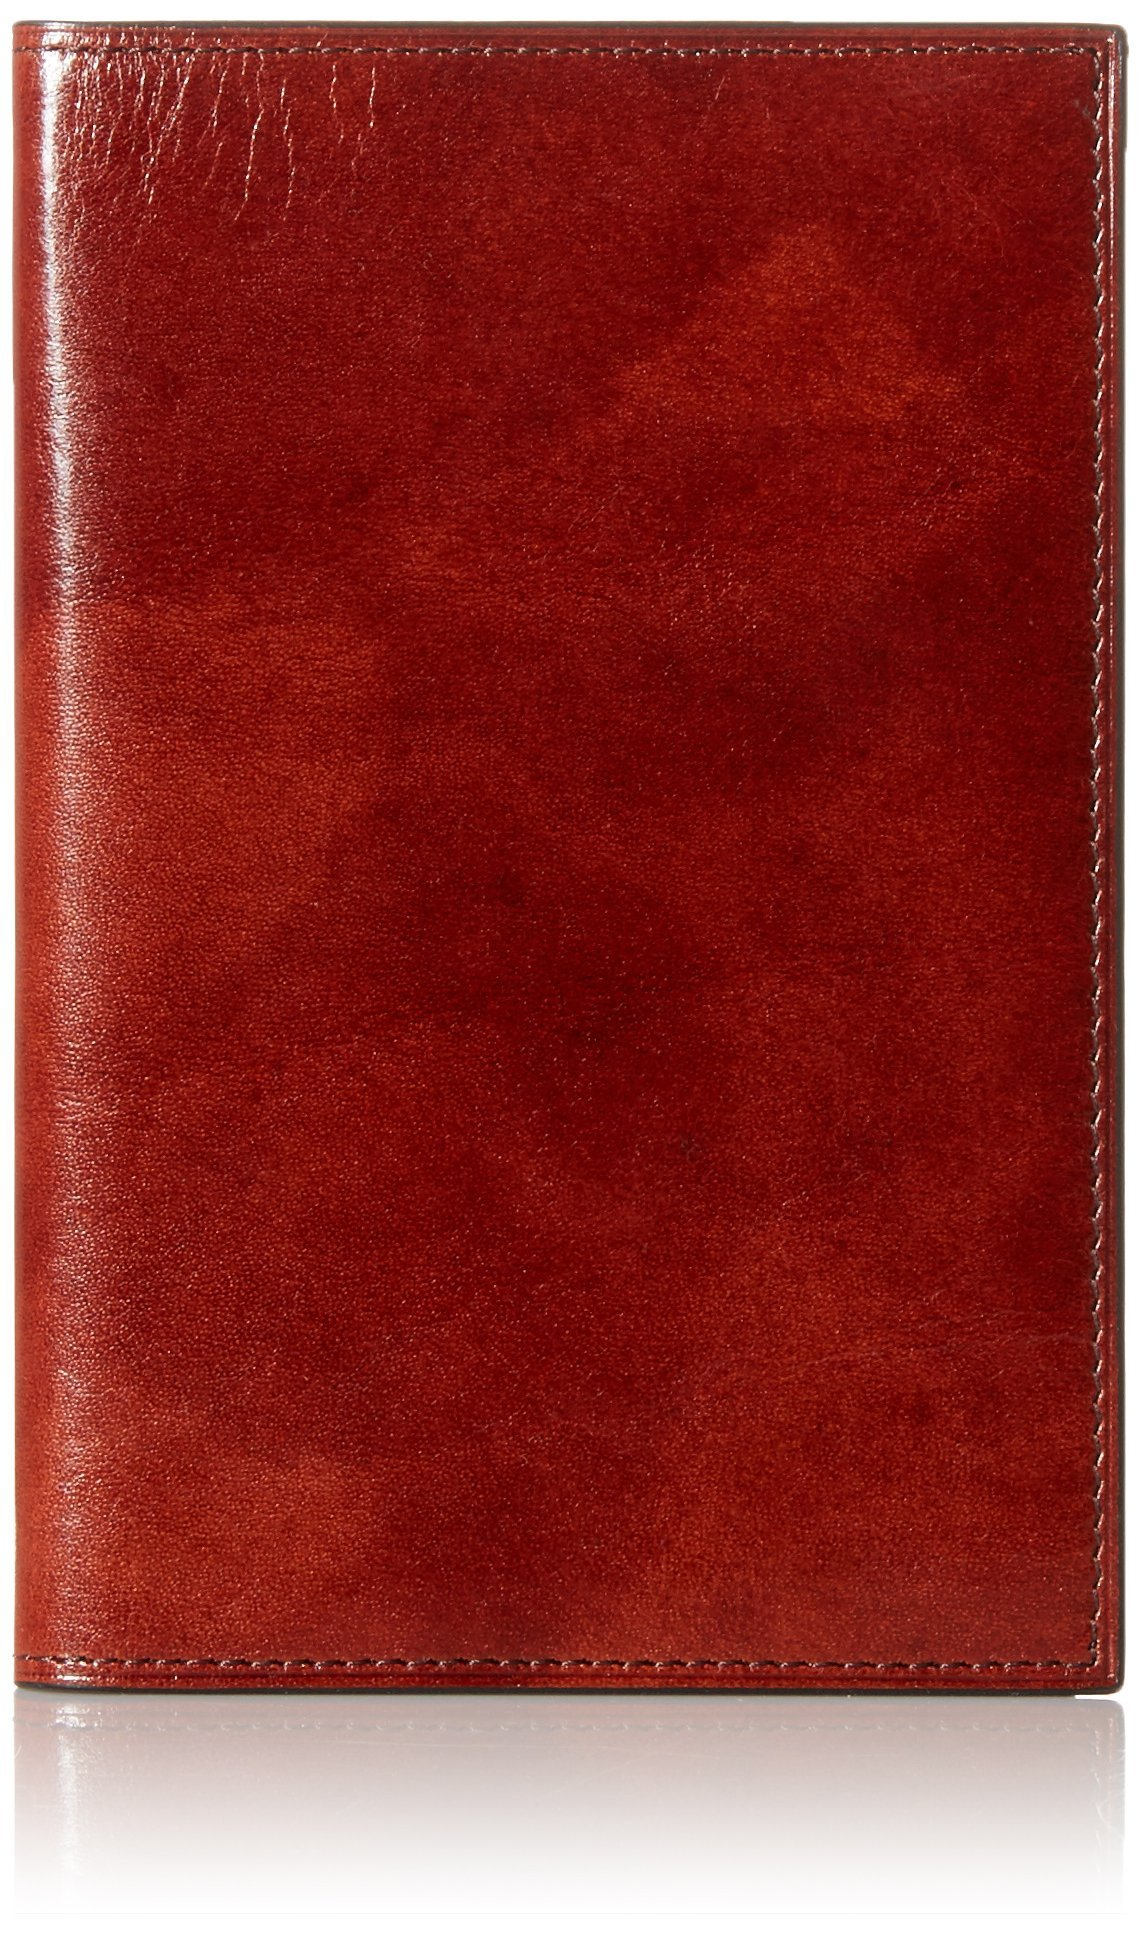 Bosca Old Leather Collection-Passport Case, Dark Brown